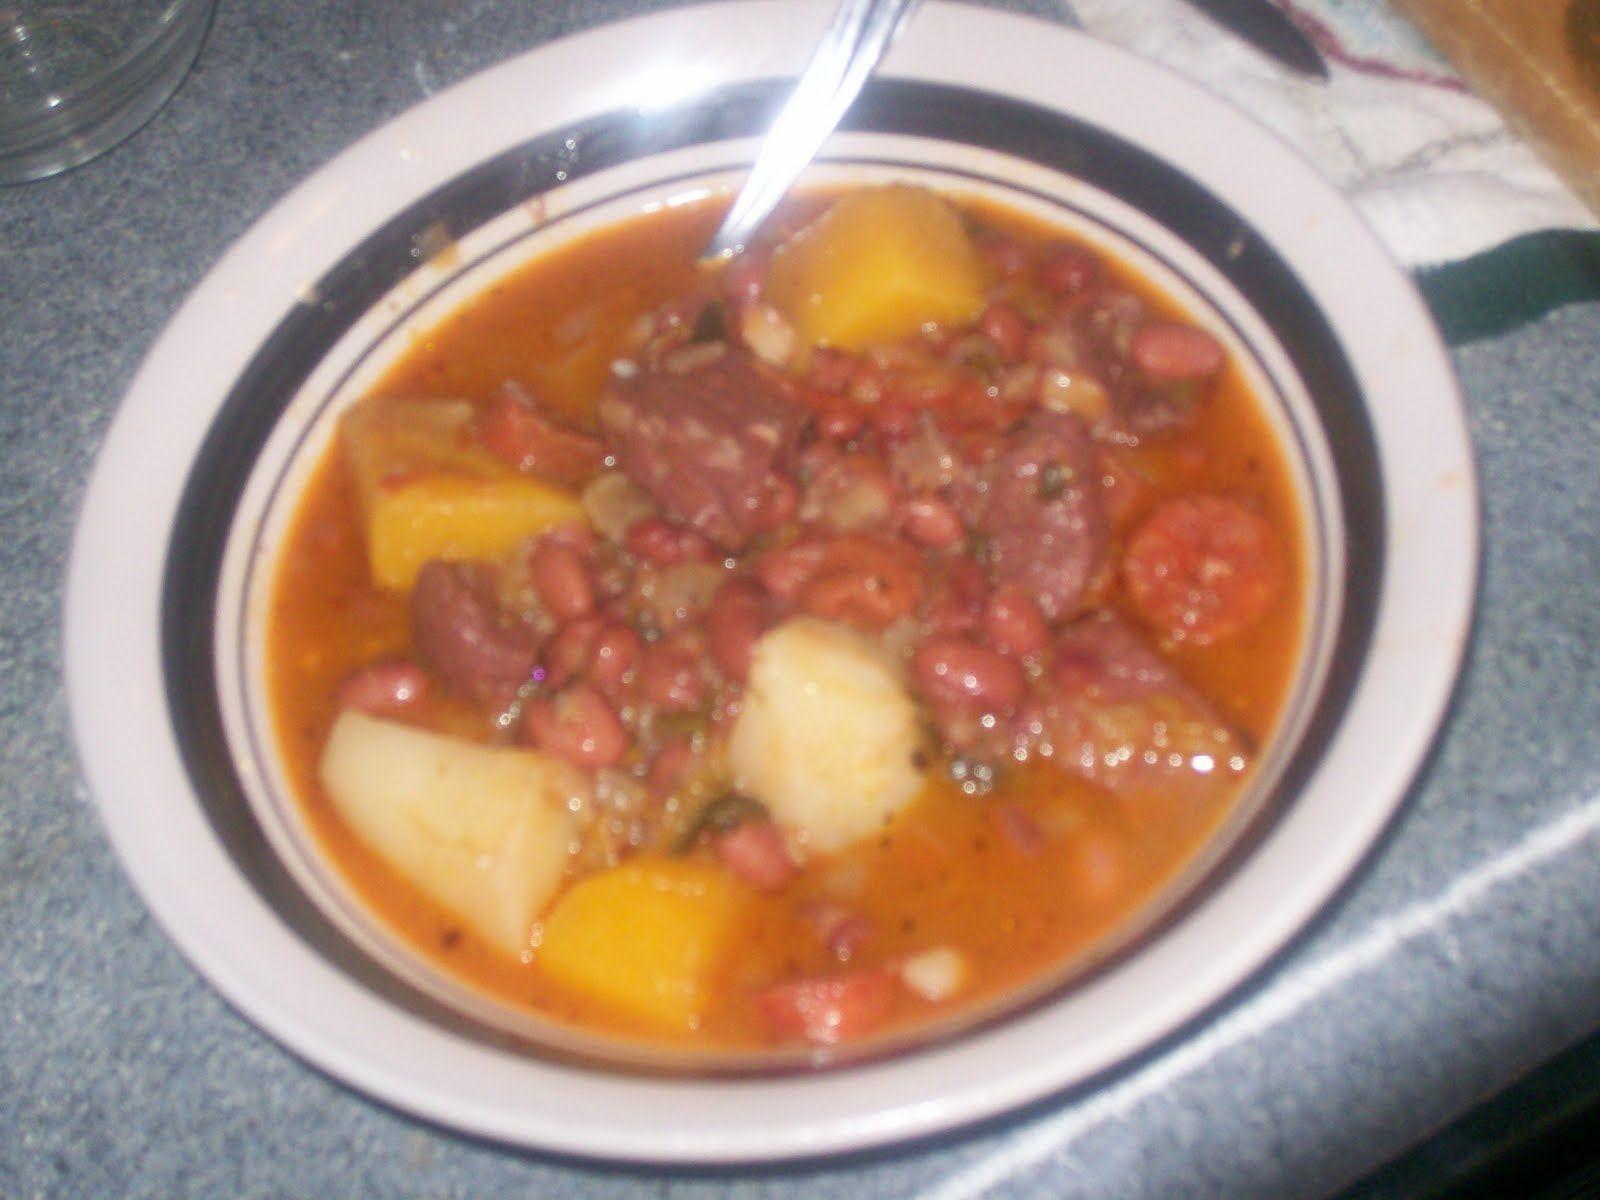 La Cocina De Nathan: Cuban, Spanish, Mexican Cooking & More: Sonia's Potaje de Frijoles Colorados (Sonia's Red Bean Stew)